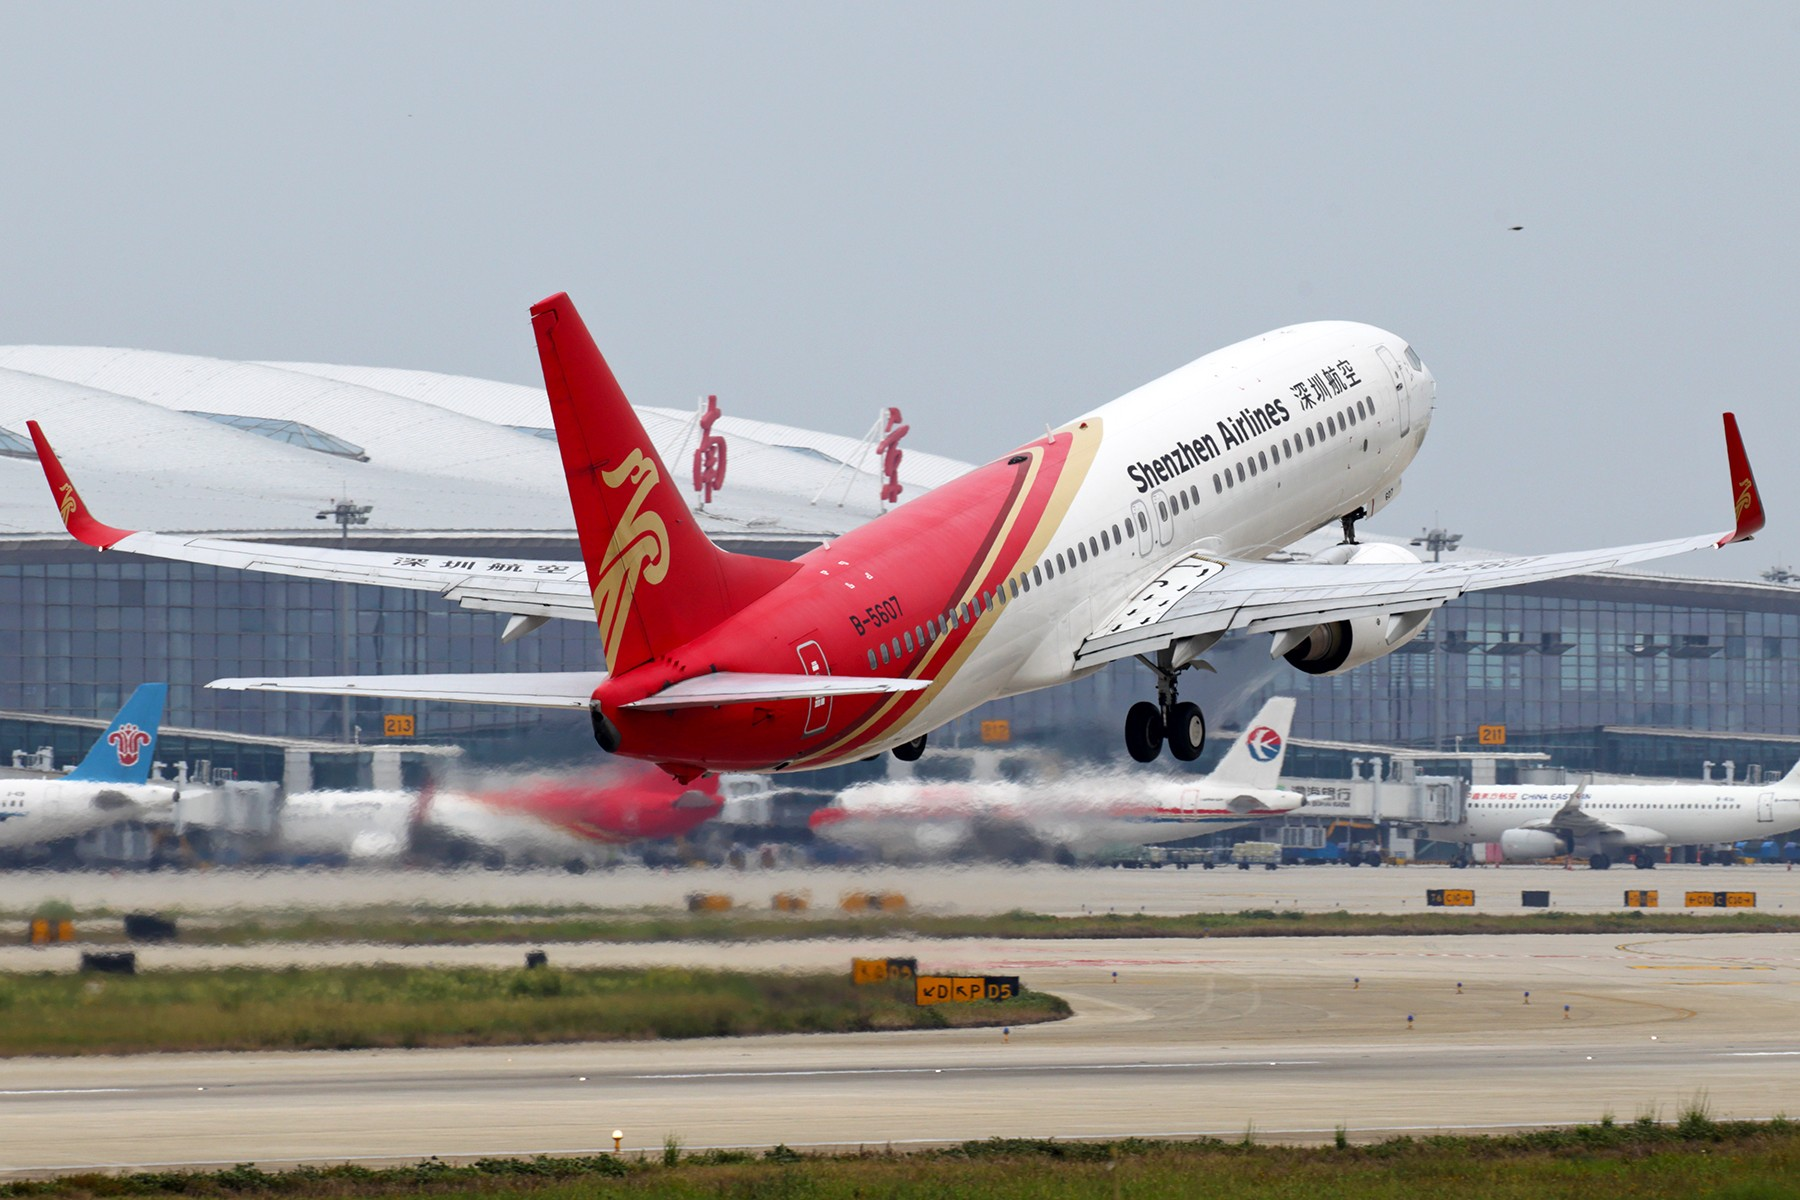 Re:[原创]【BLDDQ】******NKG07/25单跑道运行中****** BOEING 737-800 B-5607 中国南京禄口国际机场